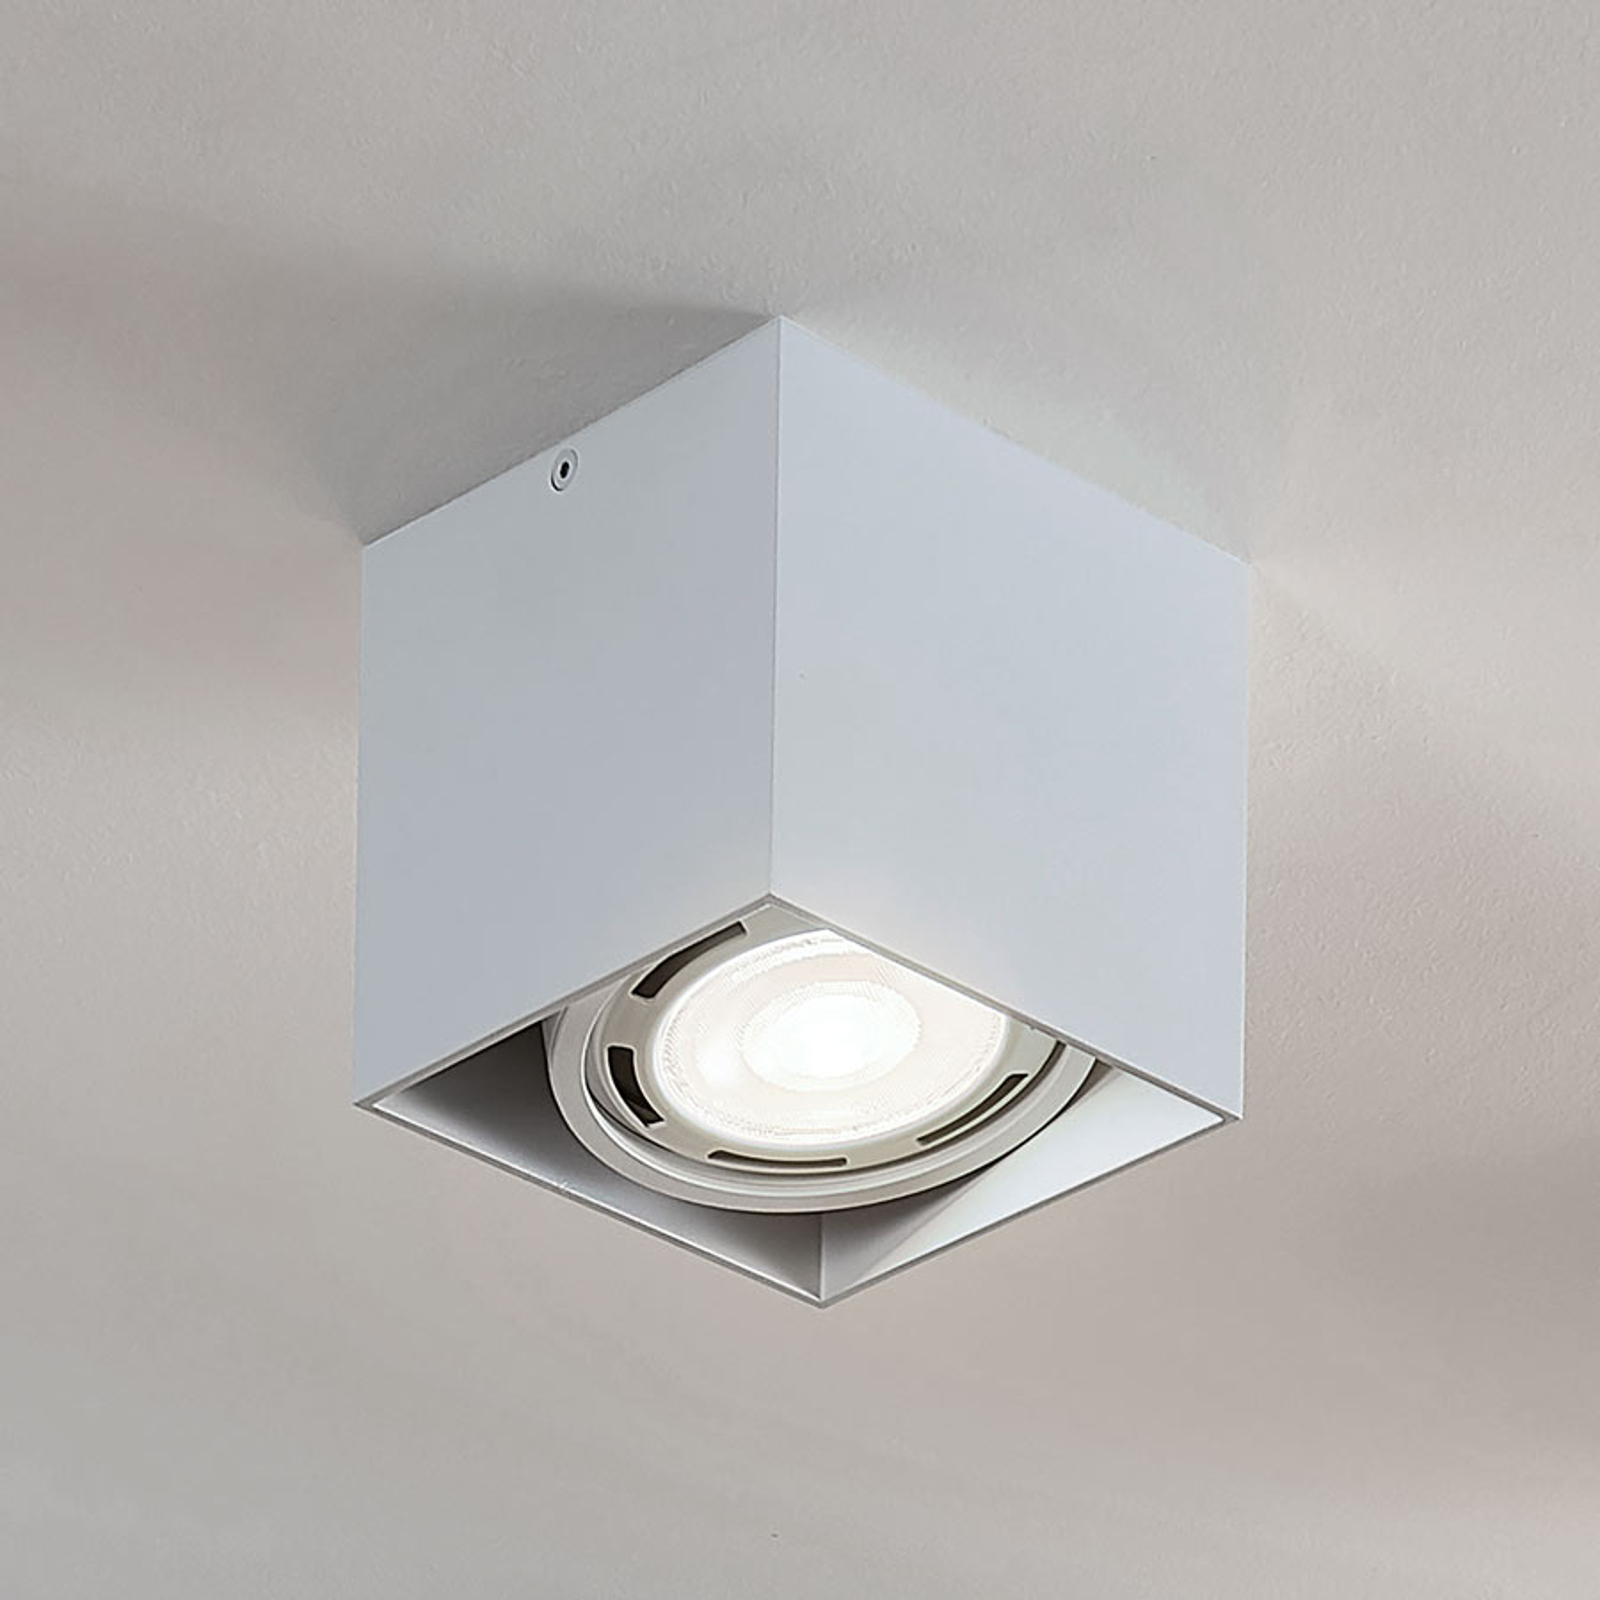 Downlight LED Rosalie à 1 lampe, angulaire, blanc